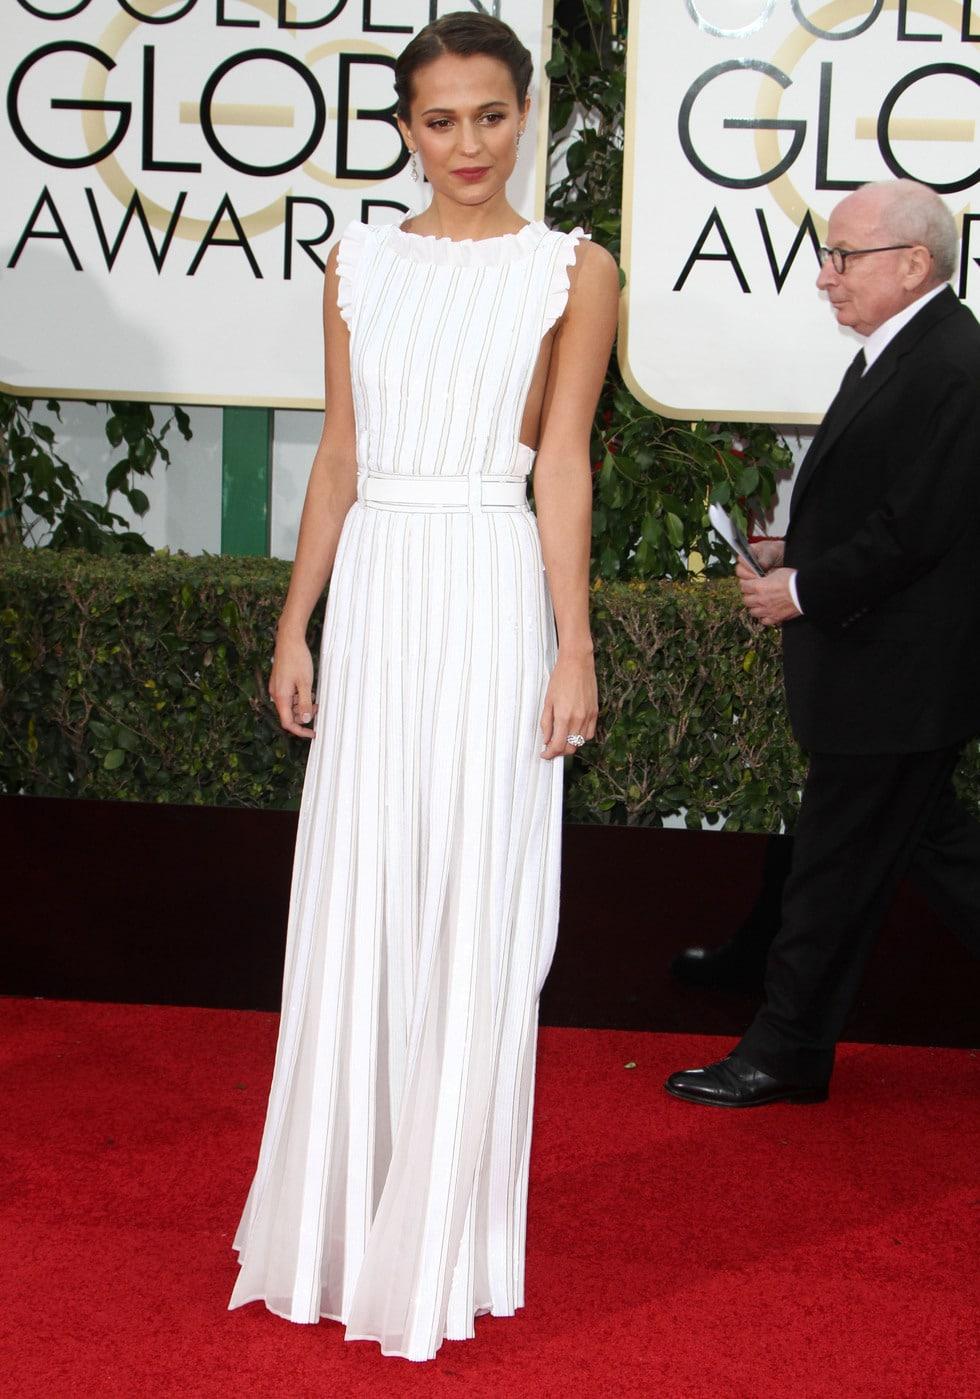 Alicia Vikander at the 2016 Golden Globes